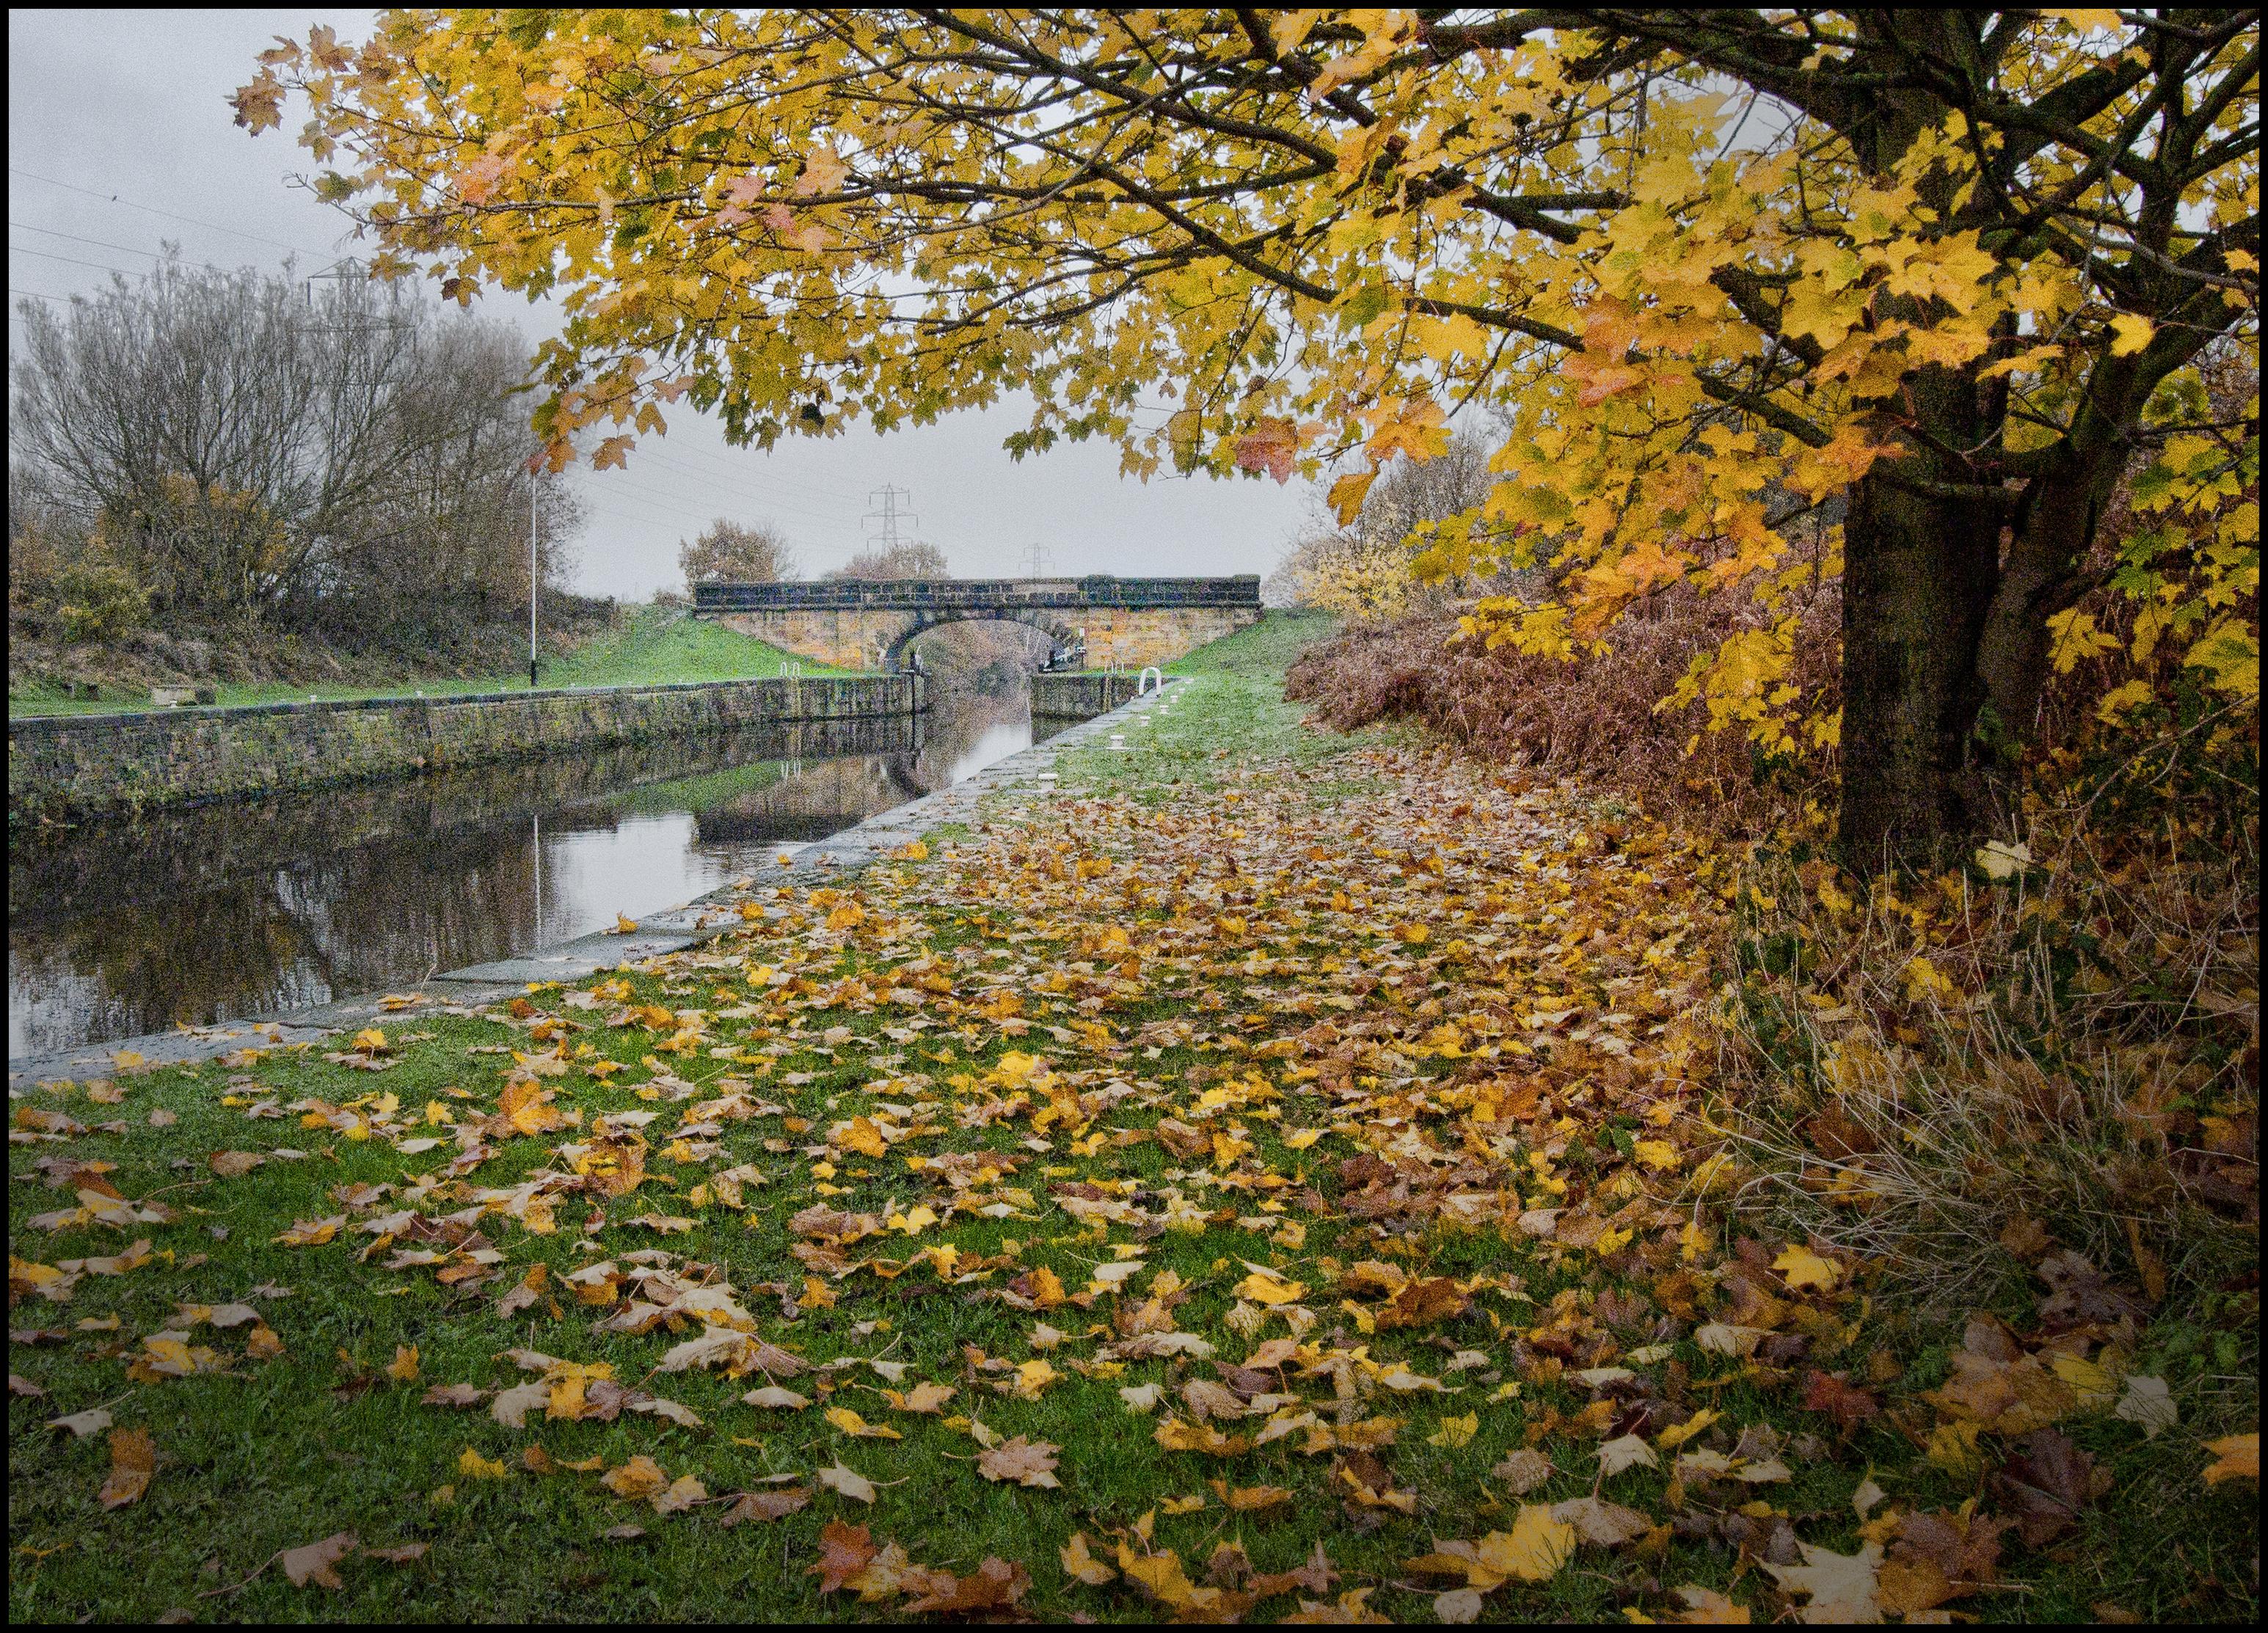 Kostenlose foto : Baum, Wasser, Natur, Ast, Boot, Brücke, Blatt ...